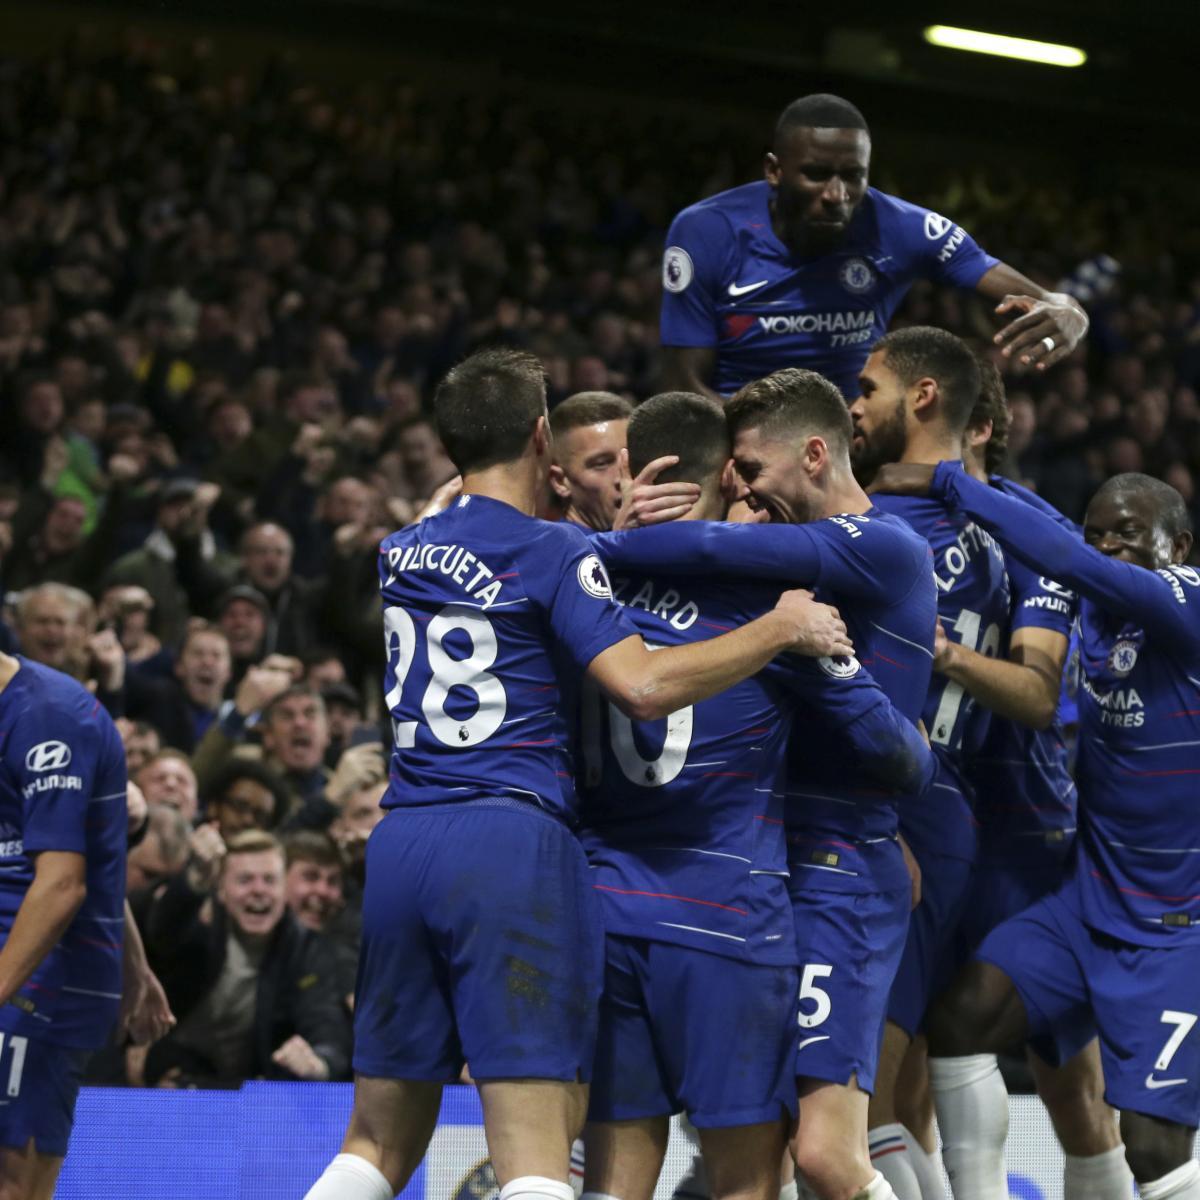 Brighton & Hove Vs. Chelsea: Odds, Preview, Live Stream